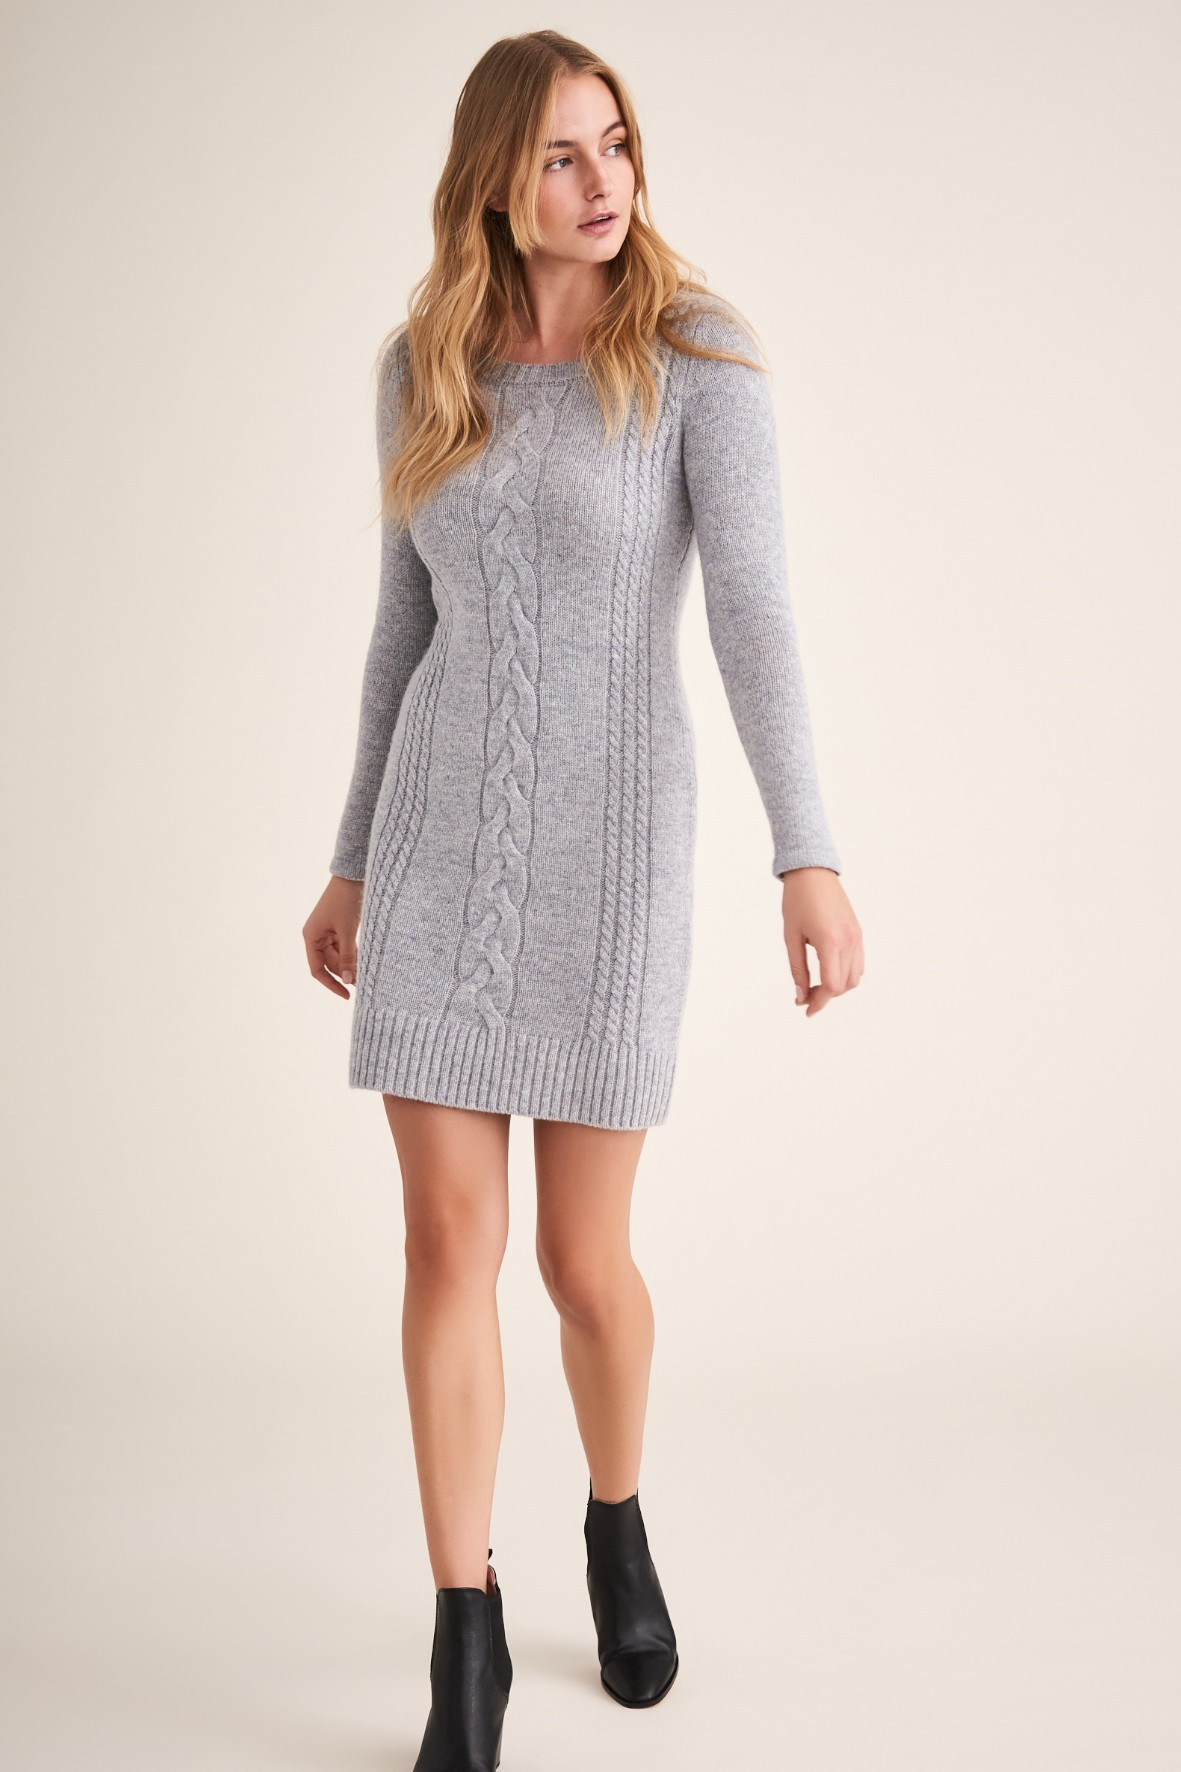 Sukienka damska swetrowa - szara